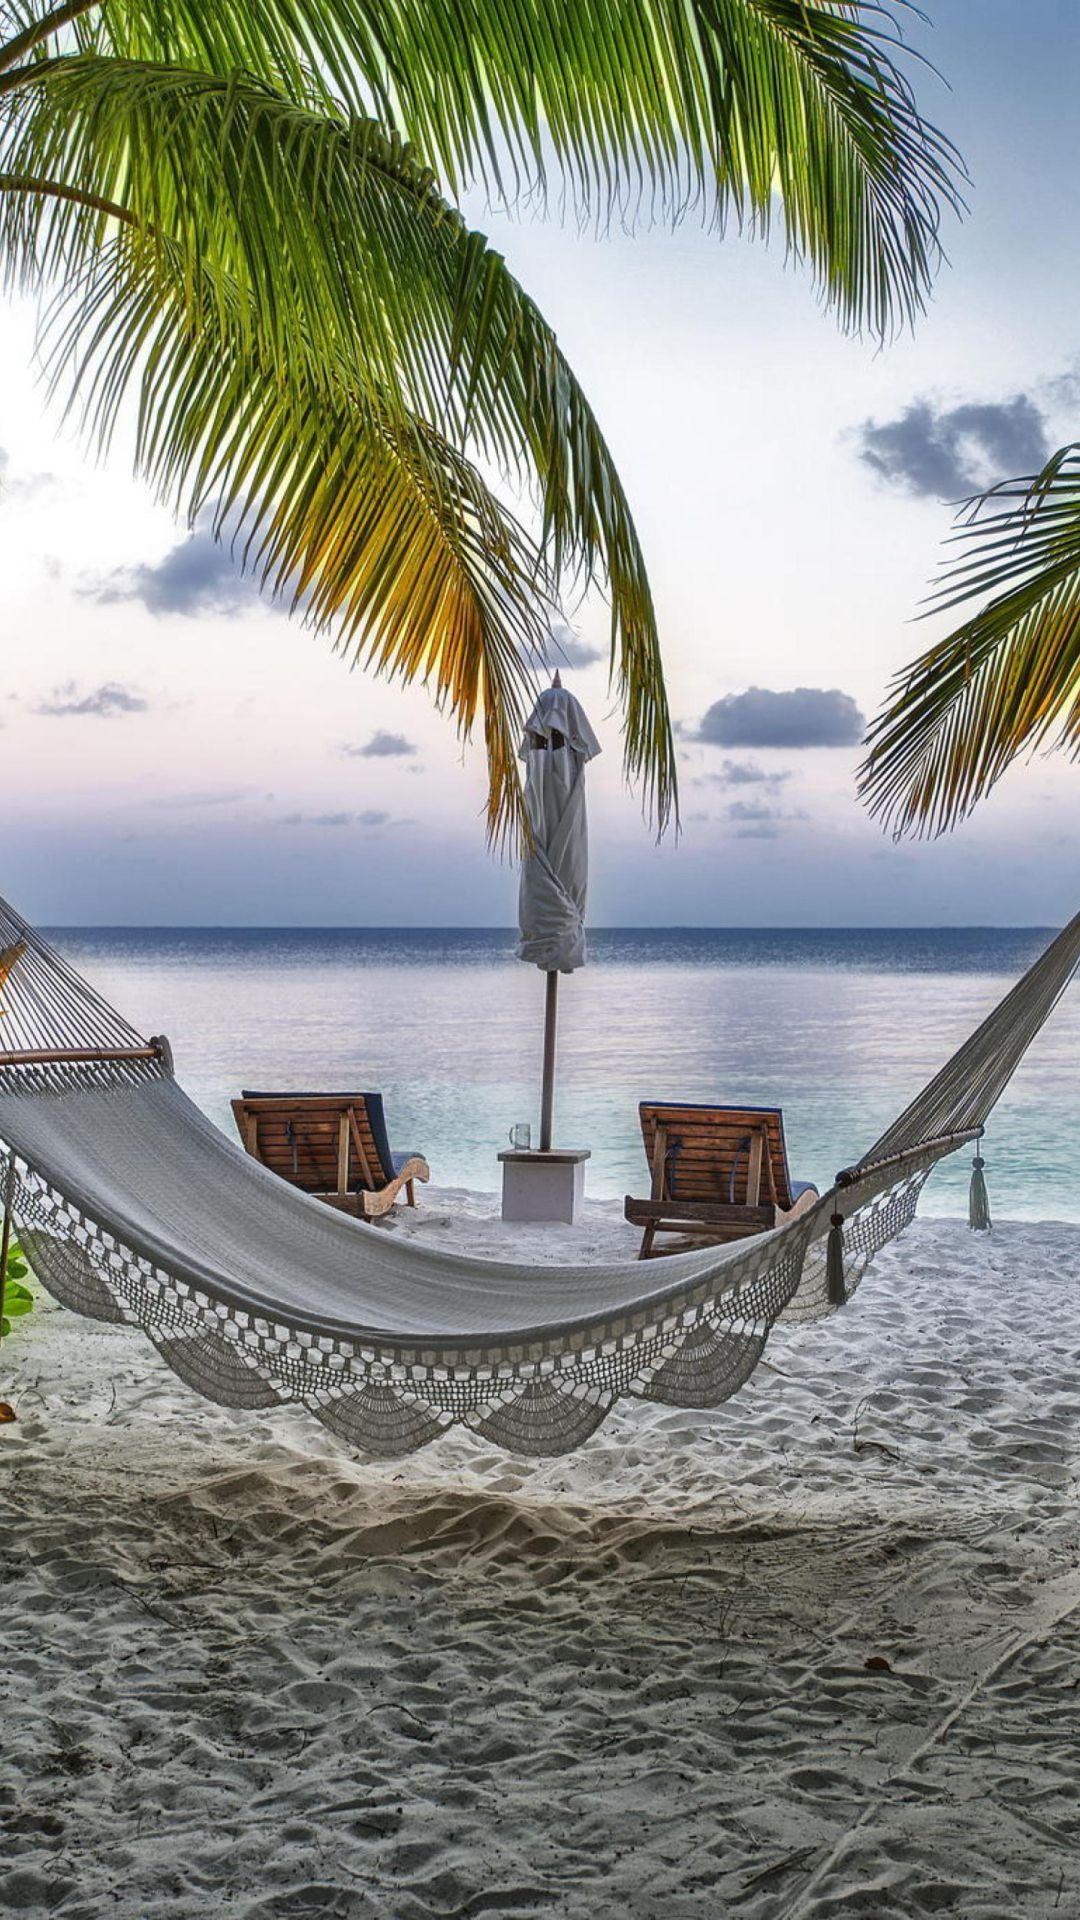 Hammock at maldives beach iphone wallpapers iPhone